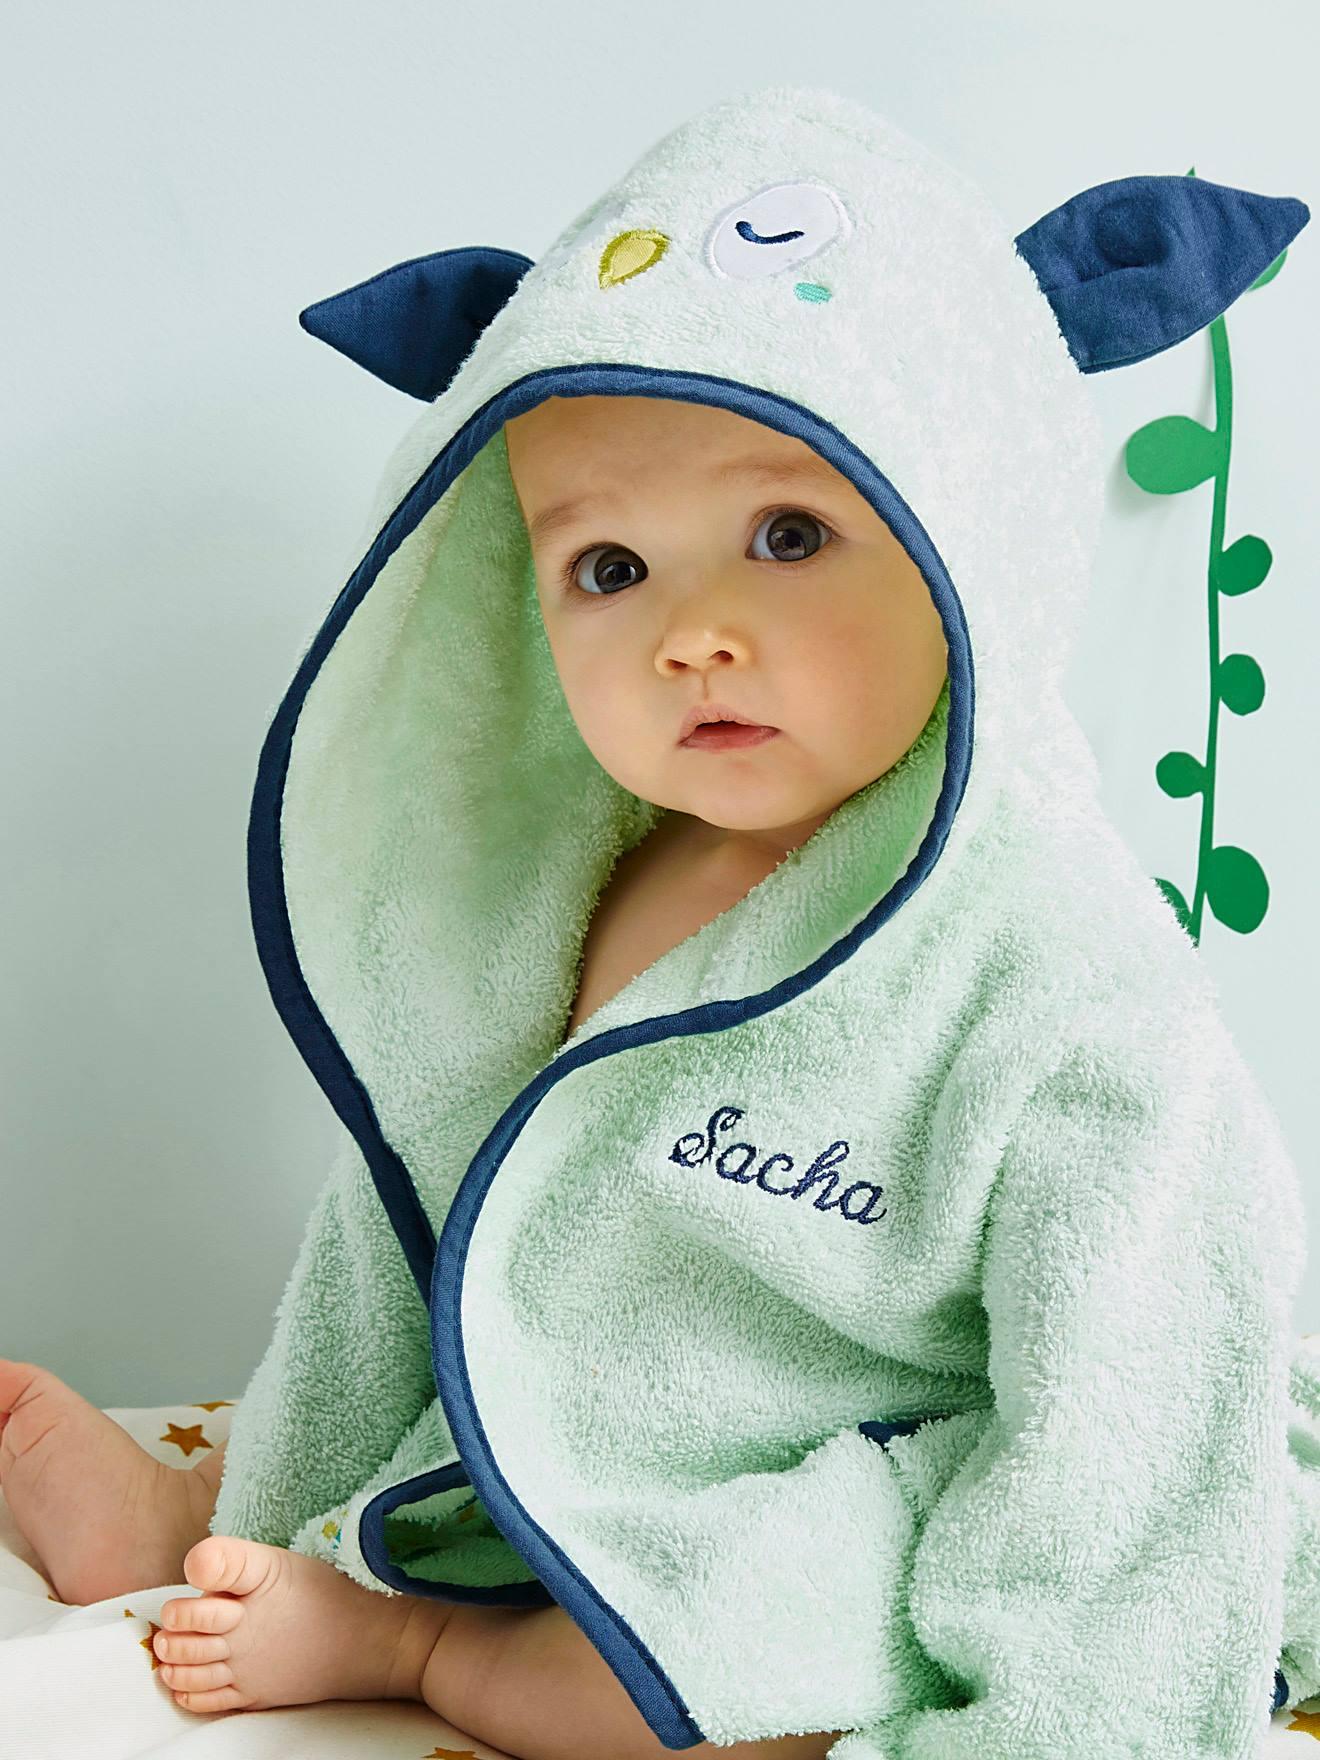 Baby Bathrobe Owl Green Light Solid With Design Bedding Decor Vertbaudet